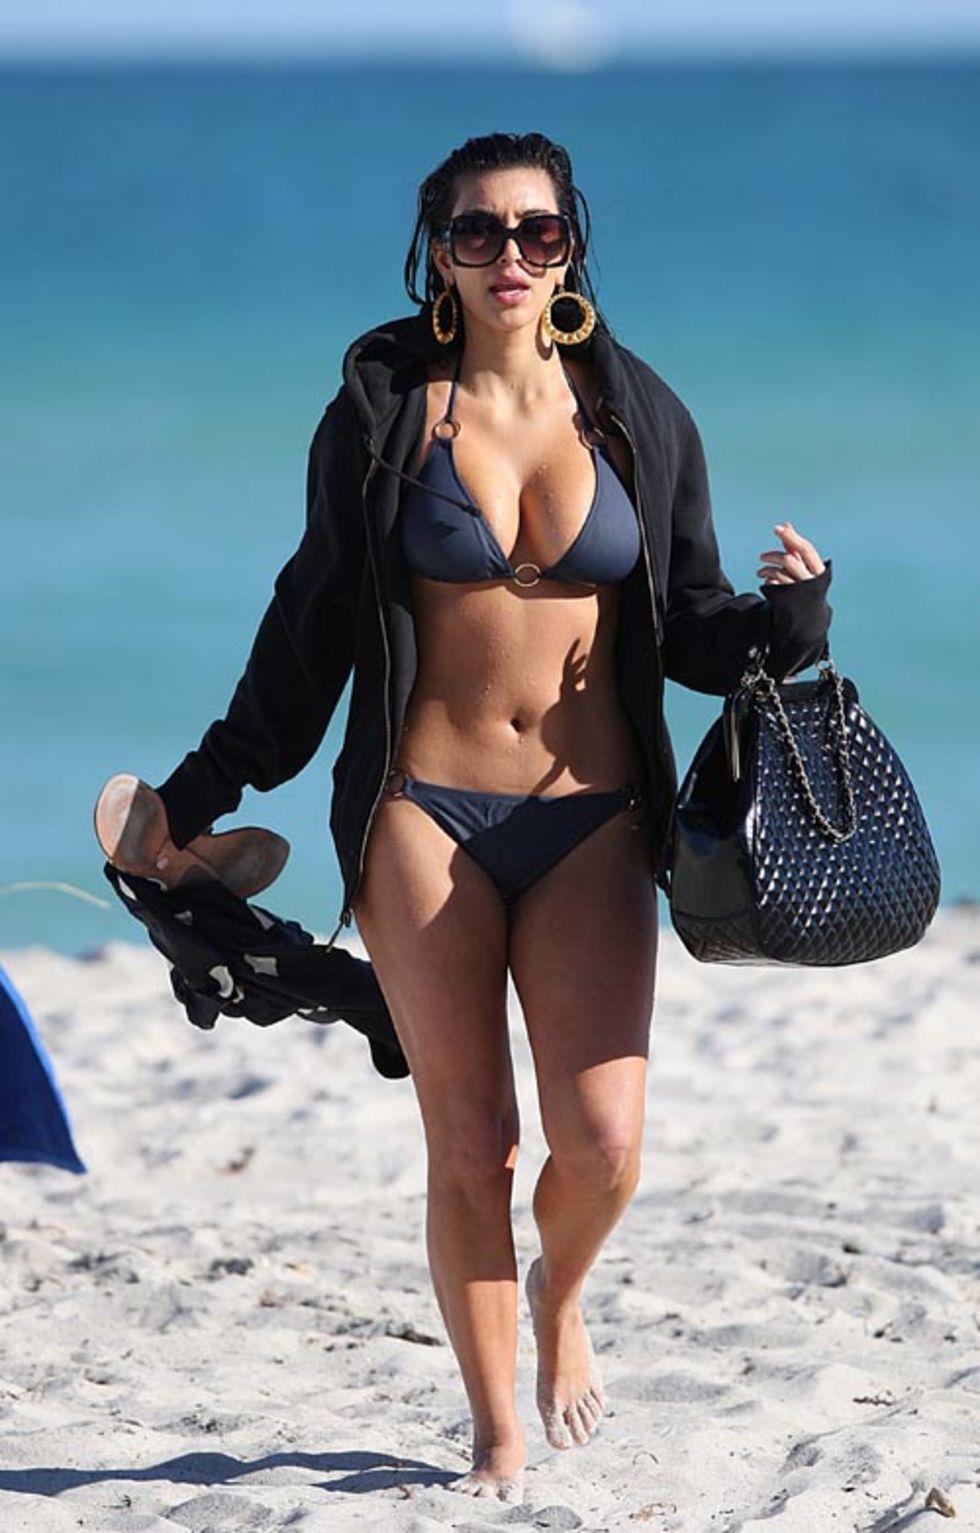 kim-kardashian-bikini-candids-at-the-beach-in-miami-mq-01